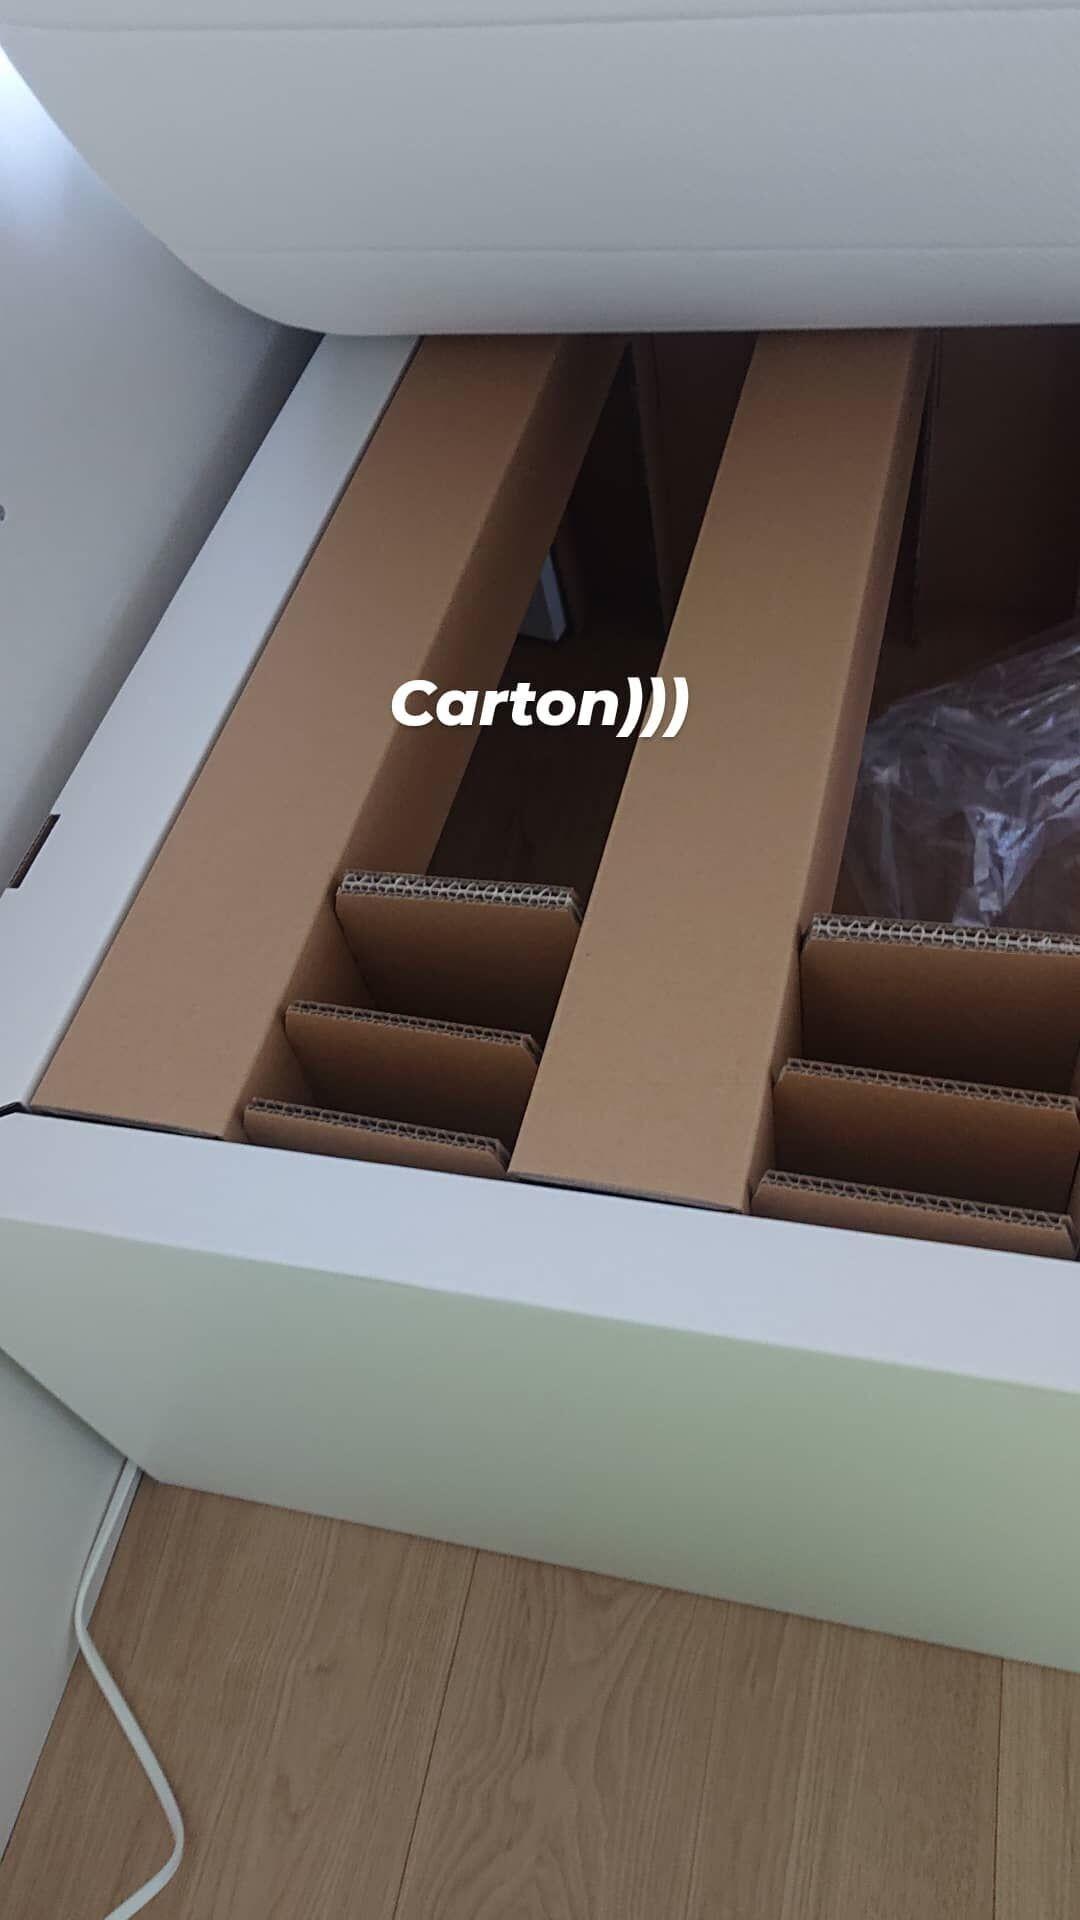 Кровати на Олимпиаде-2020 сделаны из картона.